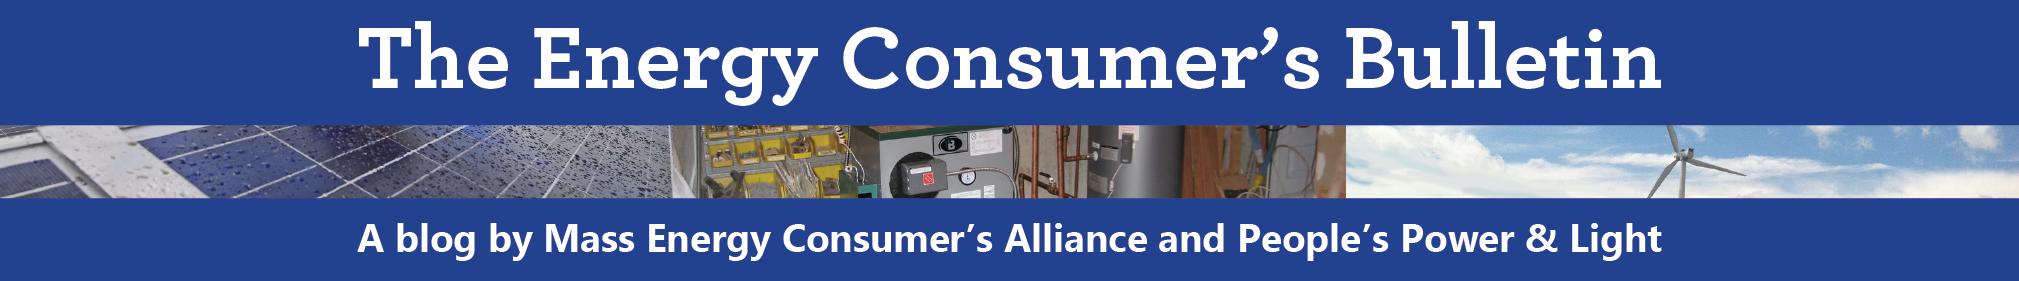 The Energy Consumer's Bulletin